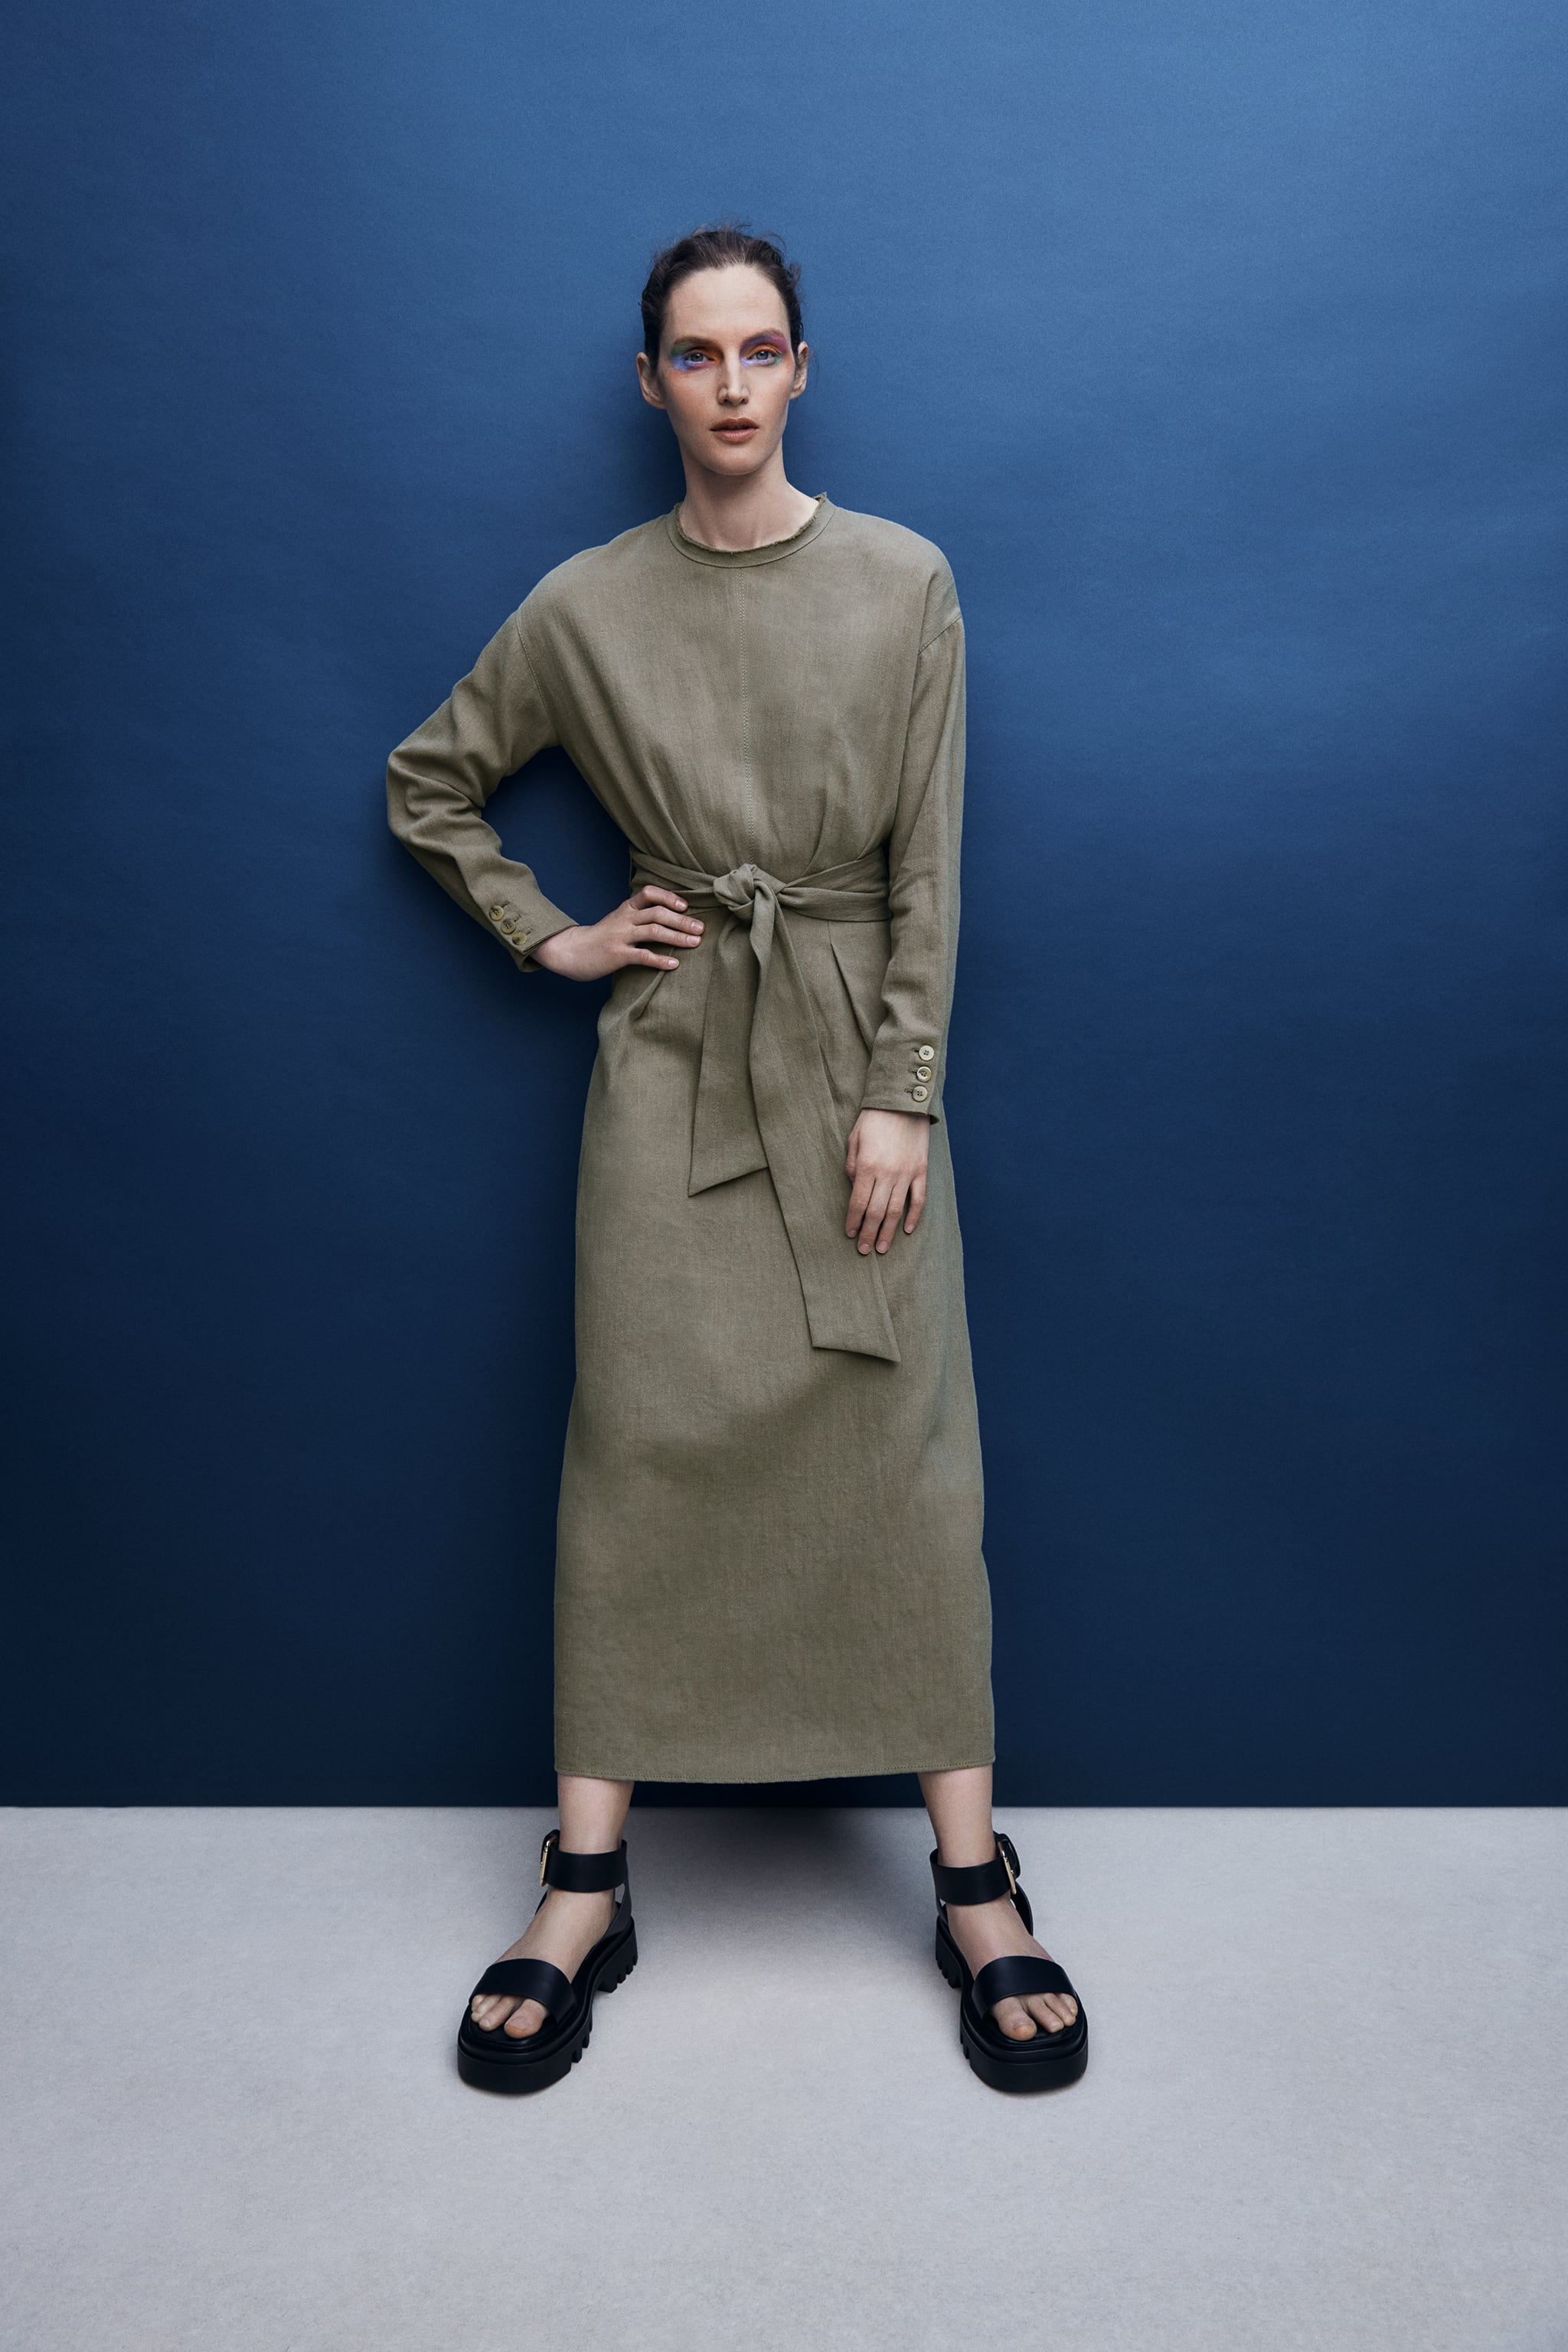 Zara LUG SOLE LEATHER SANDALS